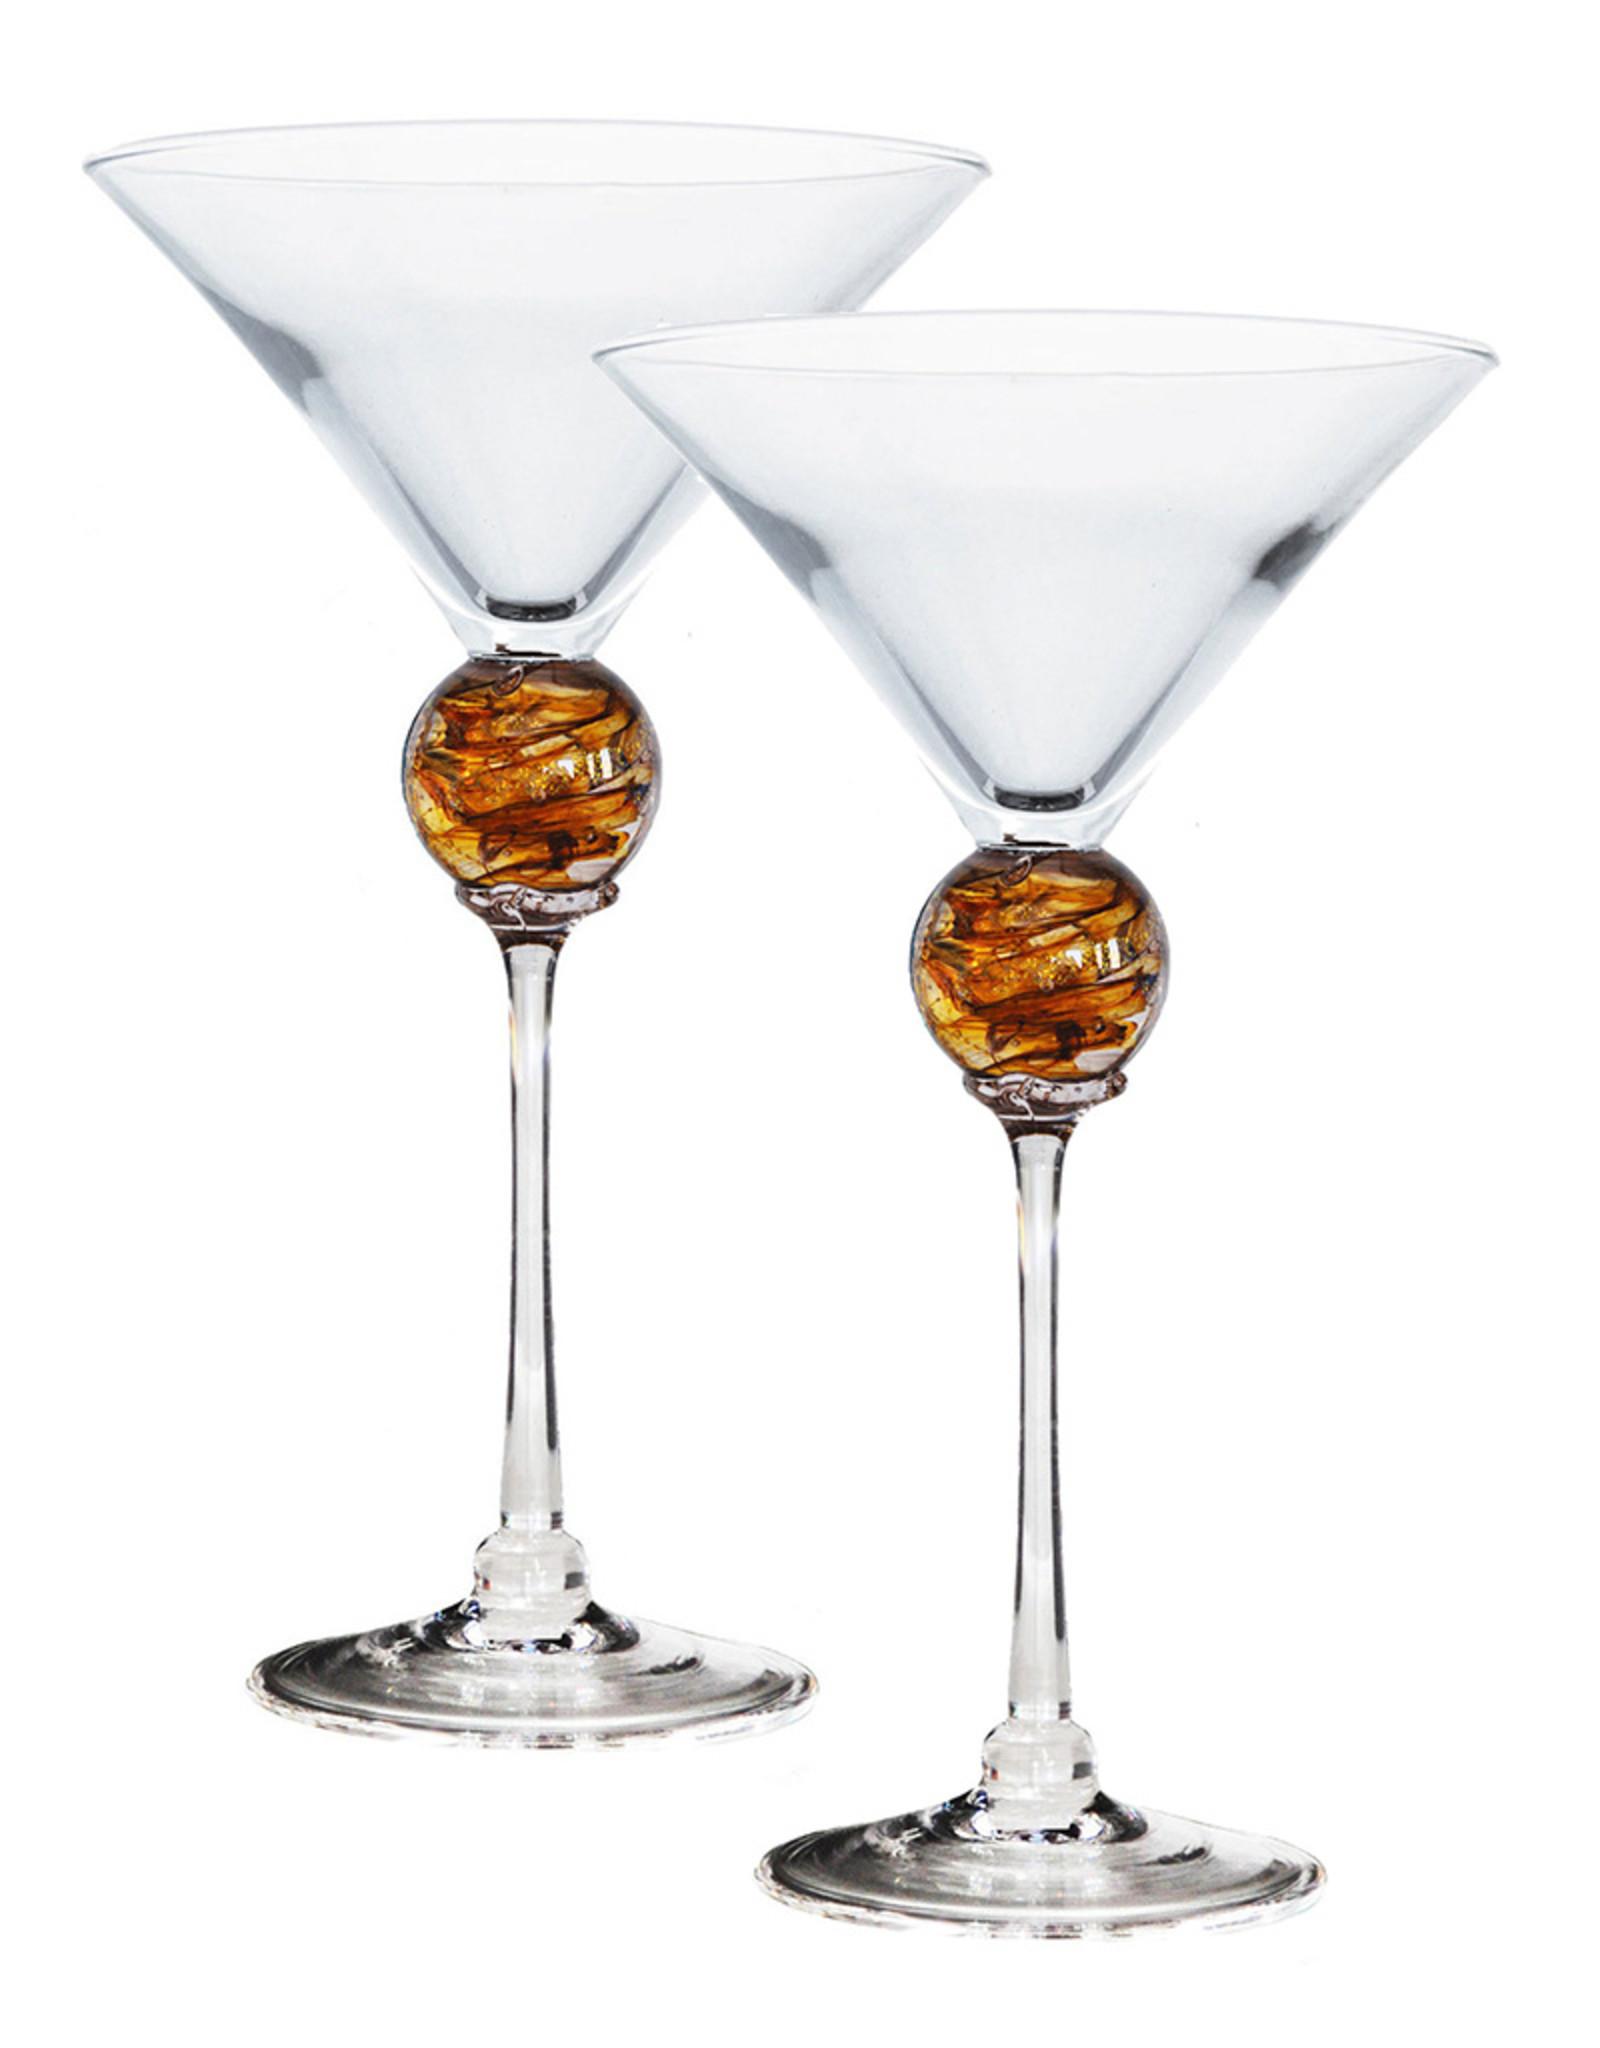 ROMEO GLASS GOLD PLANET MARTINI GLASS